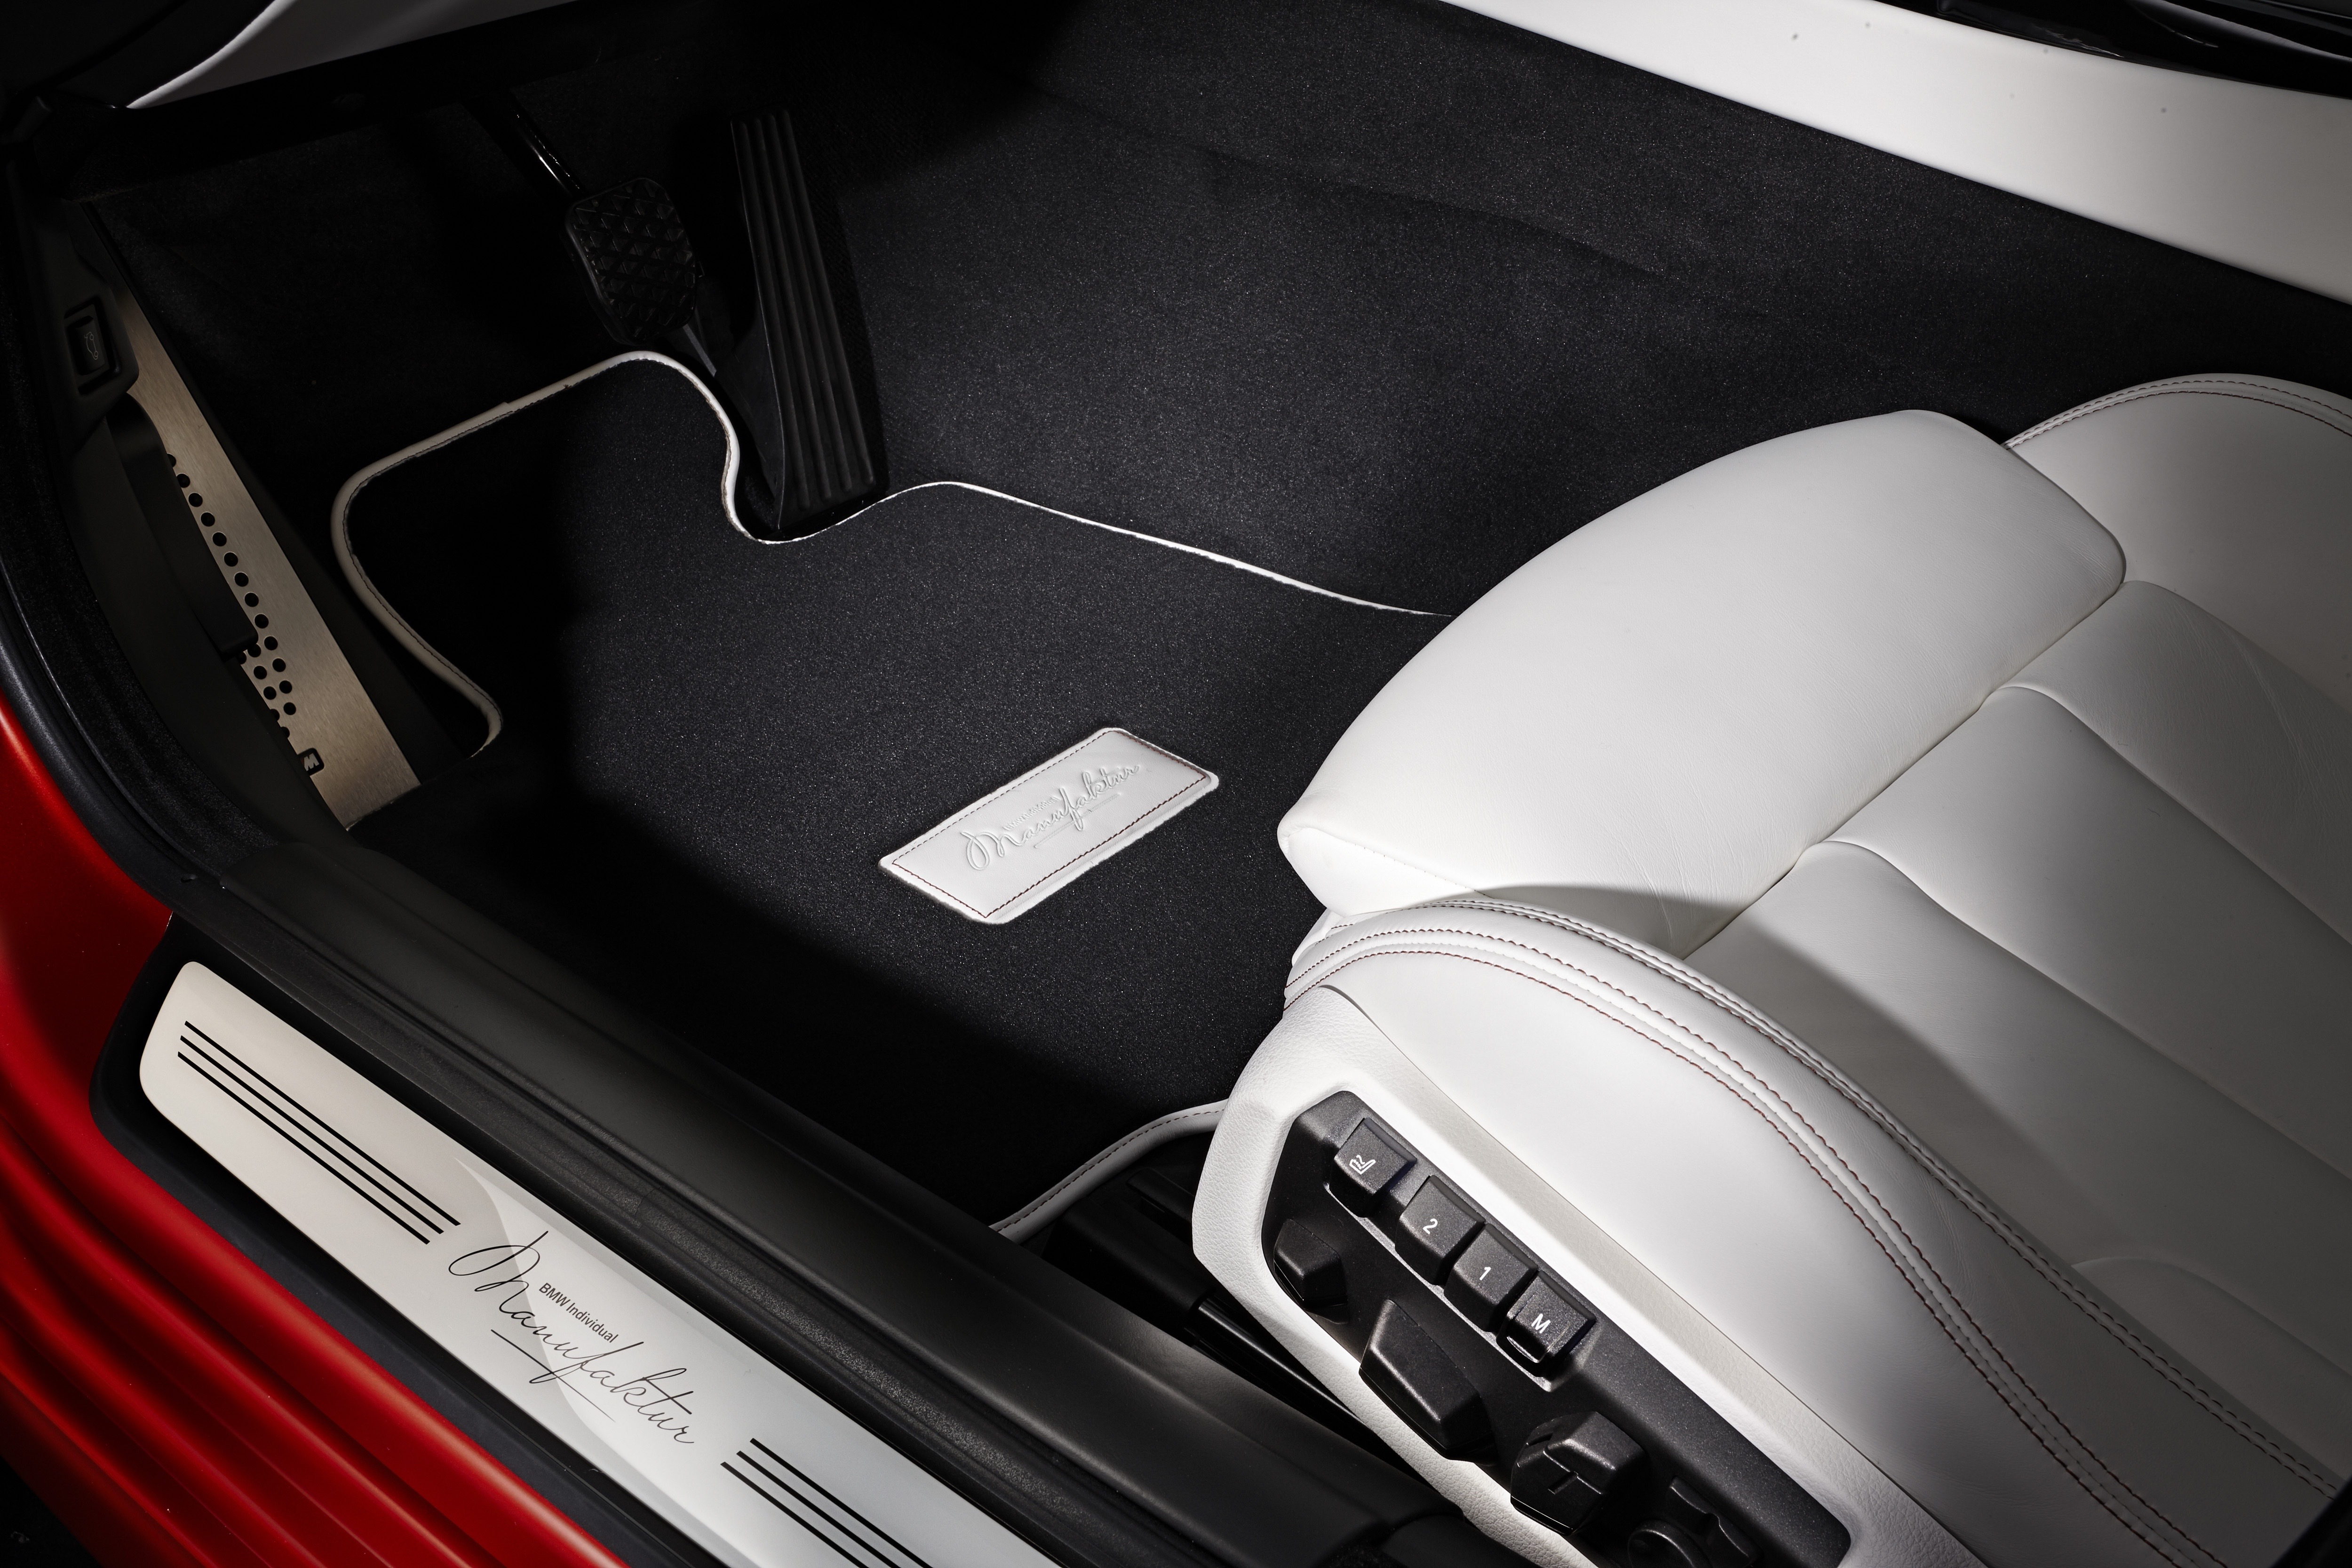 pin bmw m6 innen bild auto pixx on pinterest. Black Bedroom Furniture Sets. Home Design Ideas